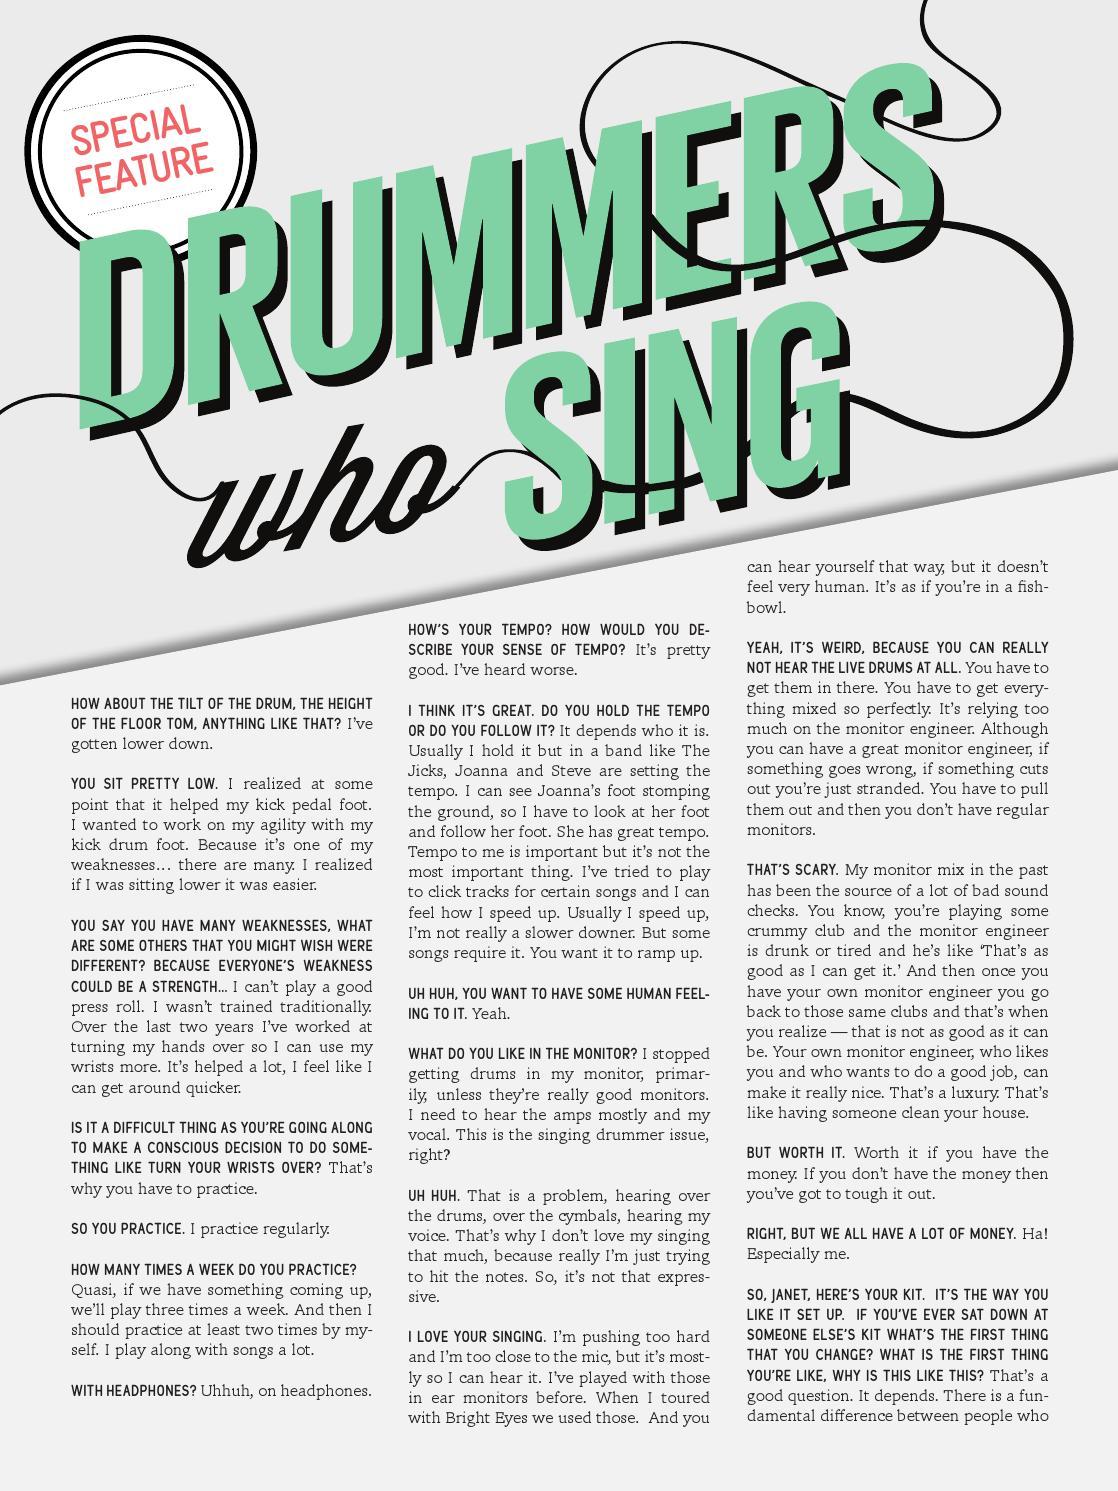 Tom Tom Magazine Issue 15: Drummers Who Sing by Tom Tom